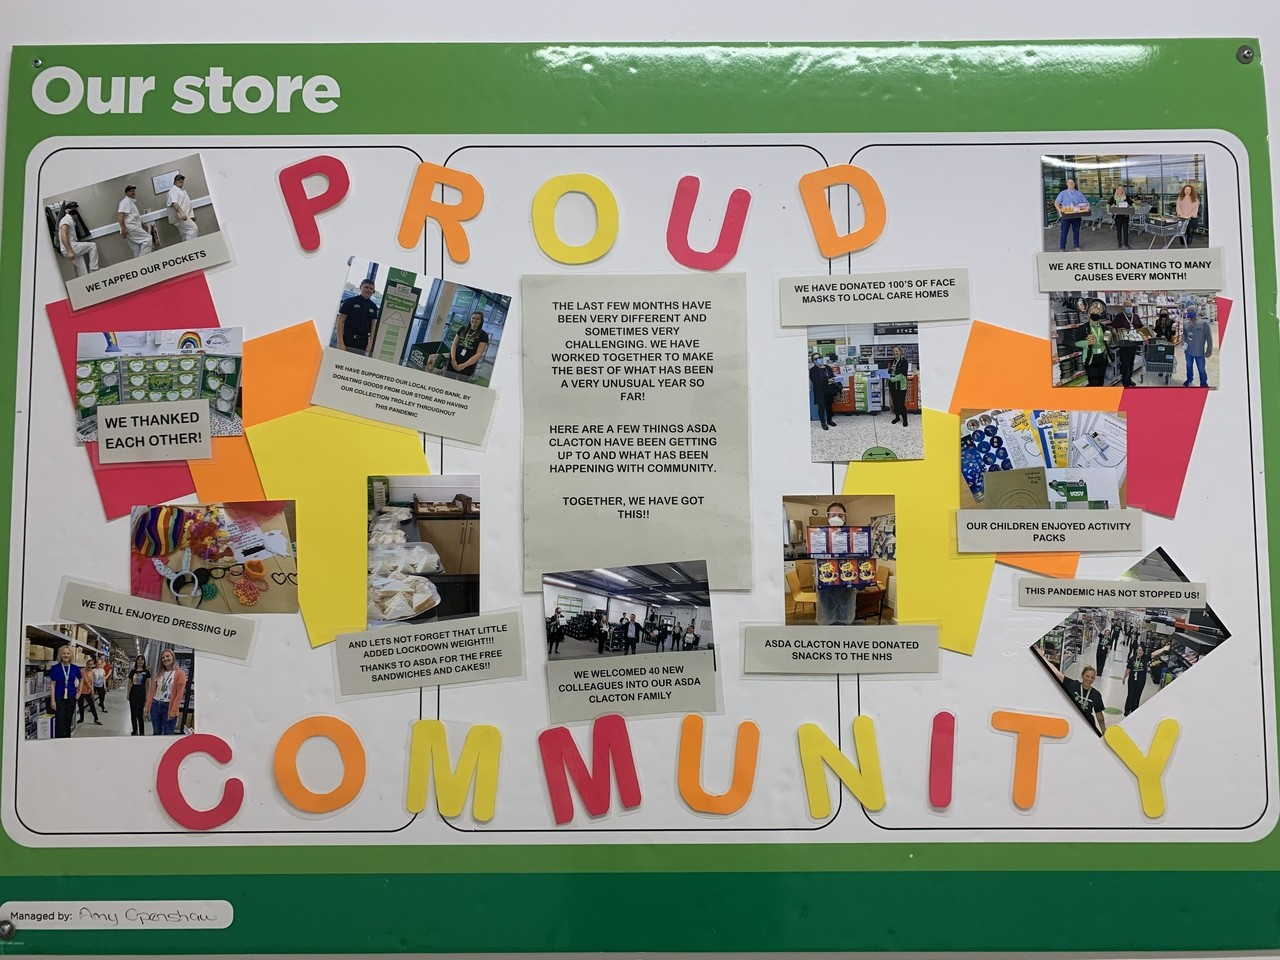 Community board | Asda Clacton-on-Sea